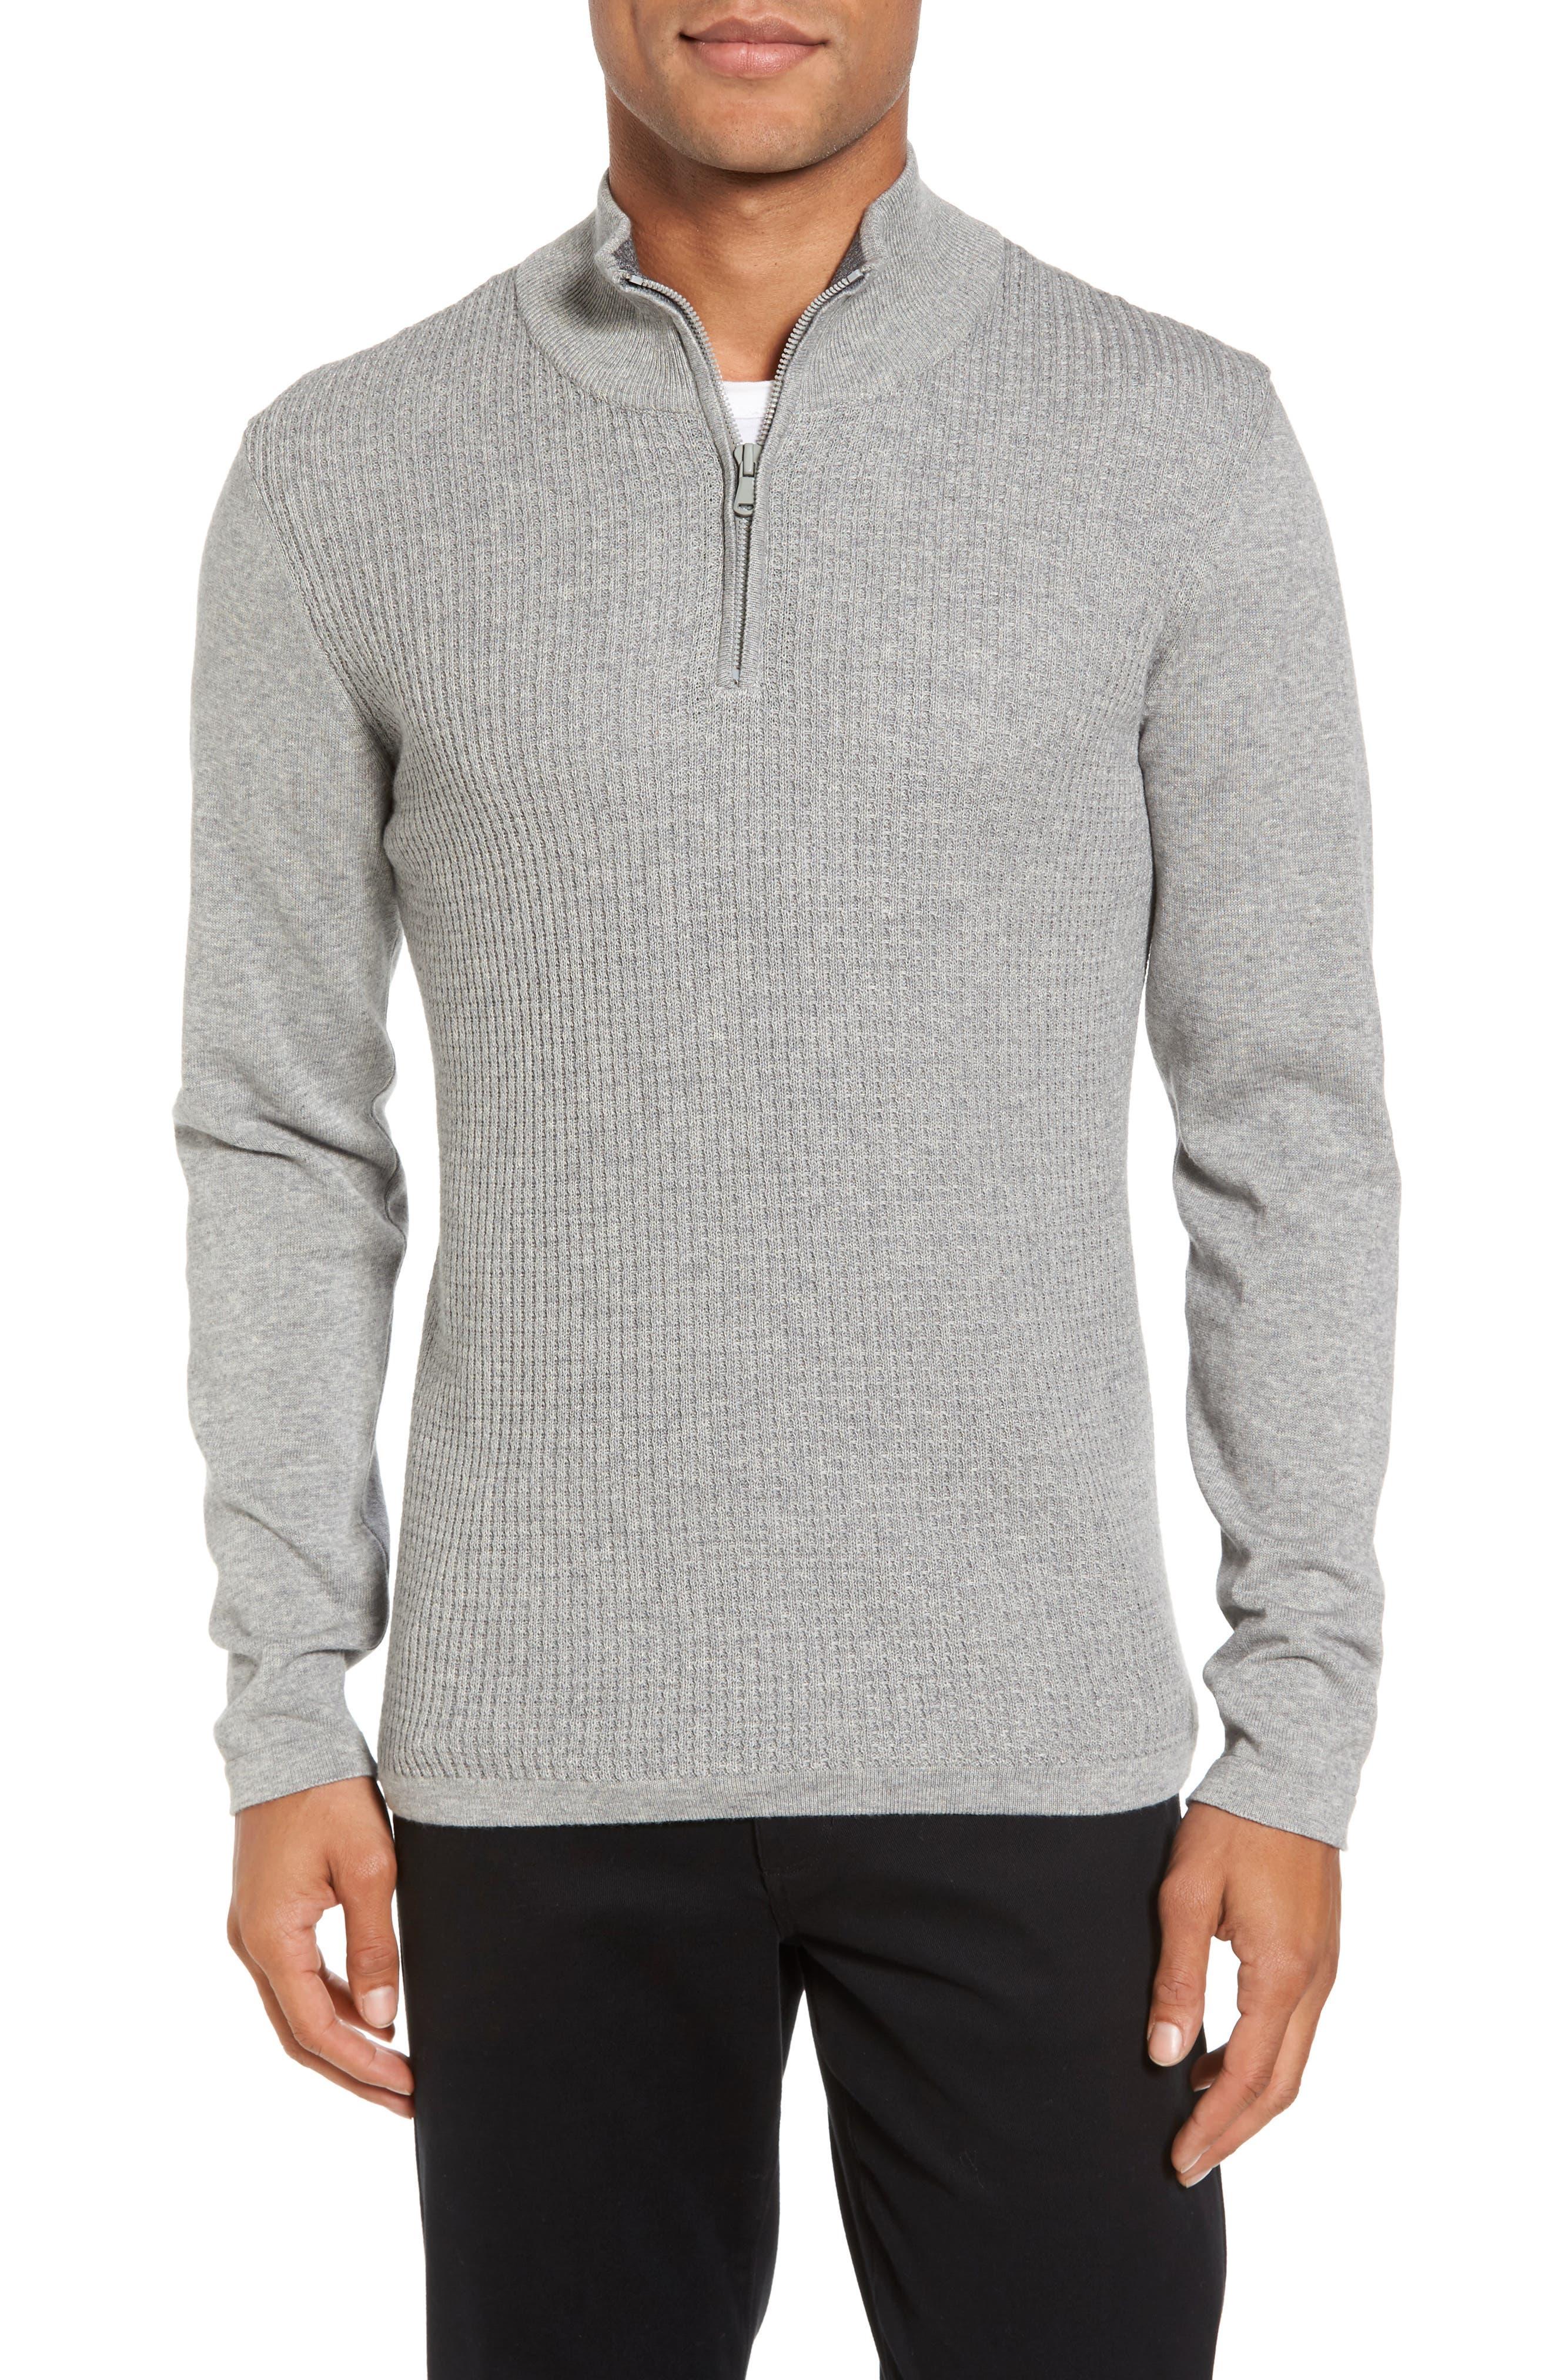 Alternate Image 1 Selected - Zachary Prell Higgins Quarter Zip Sweater